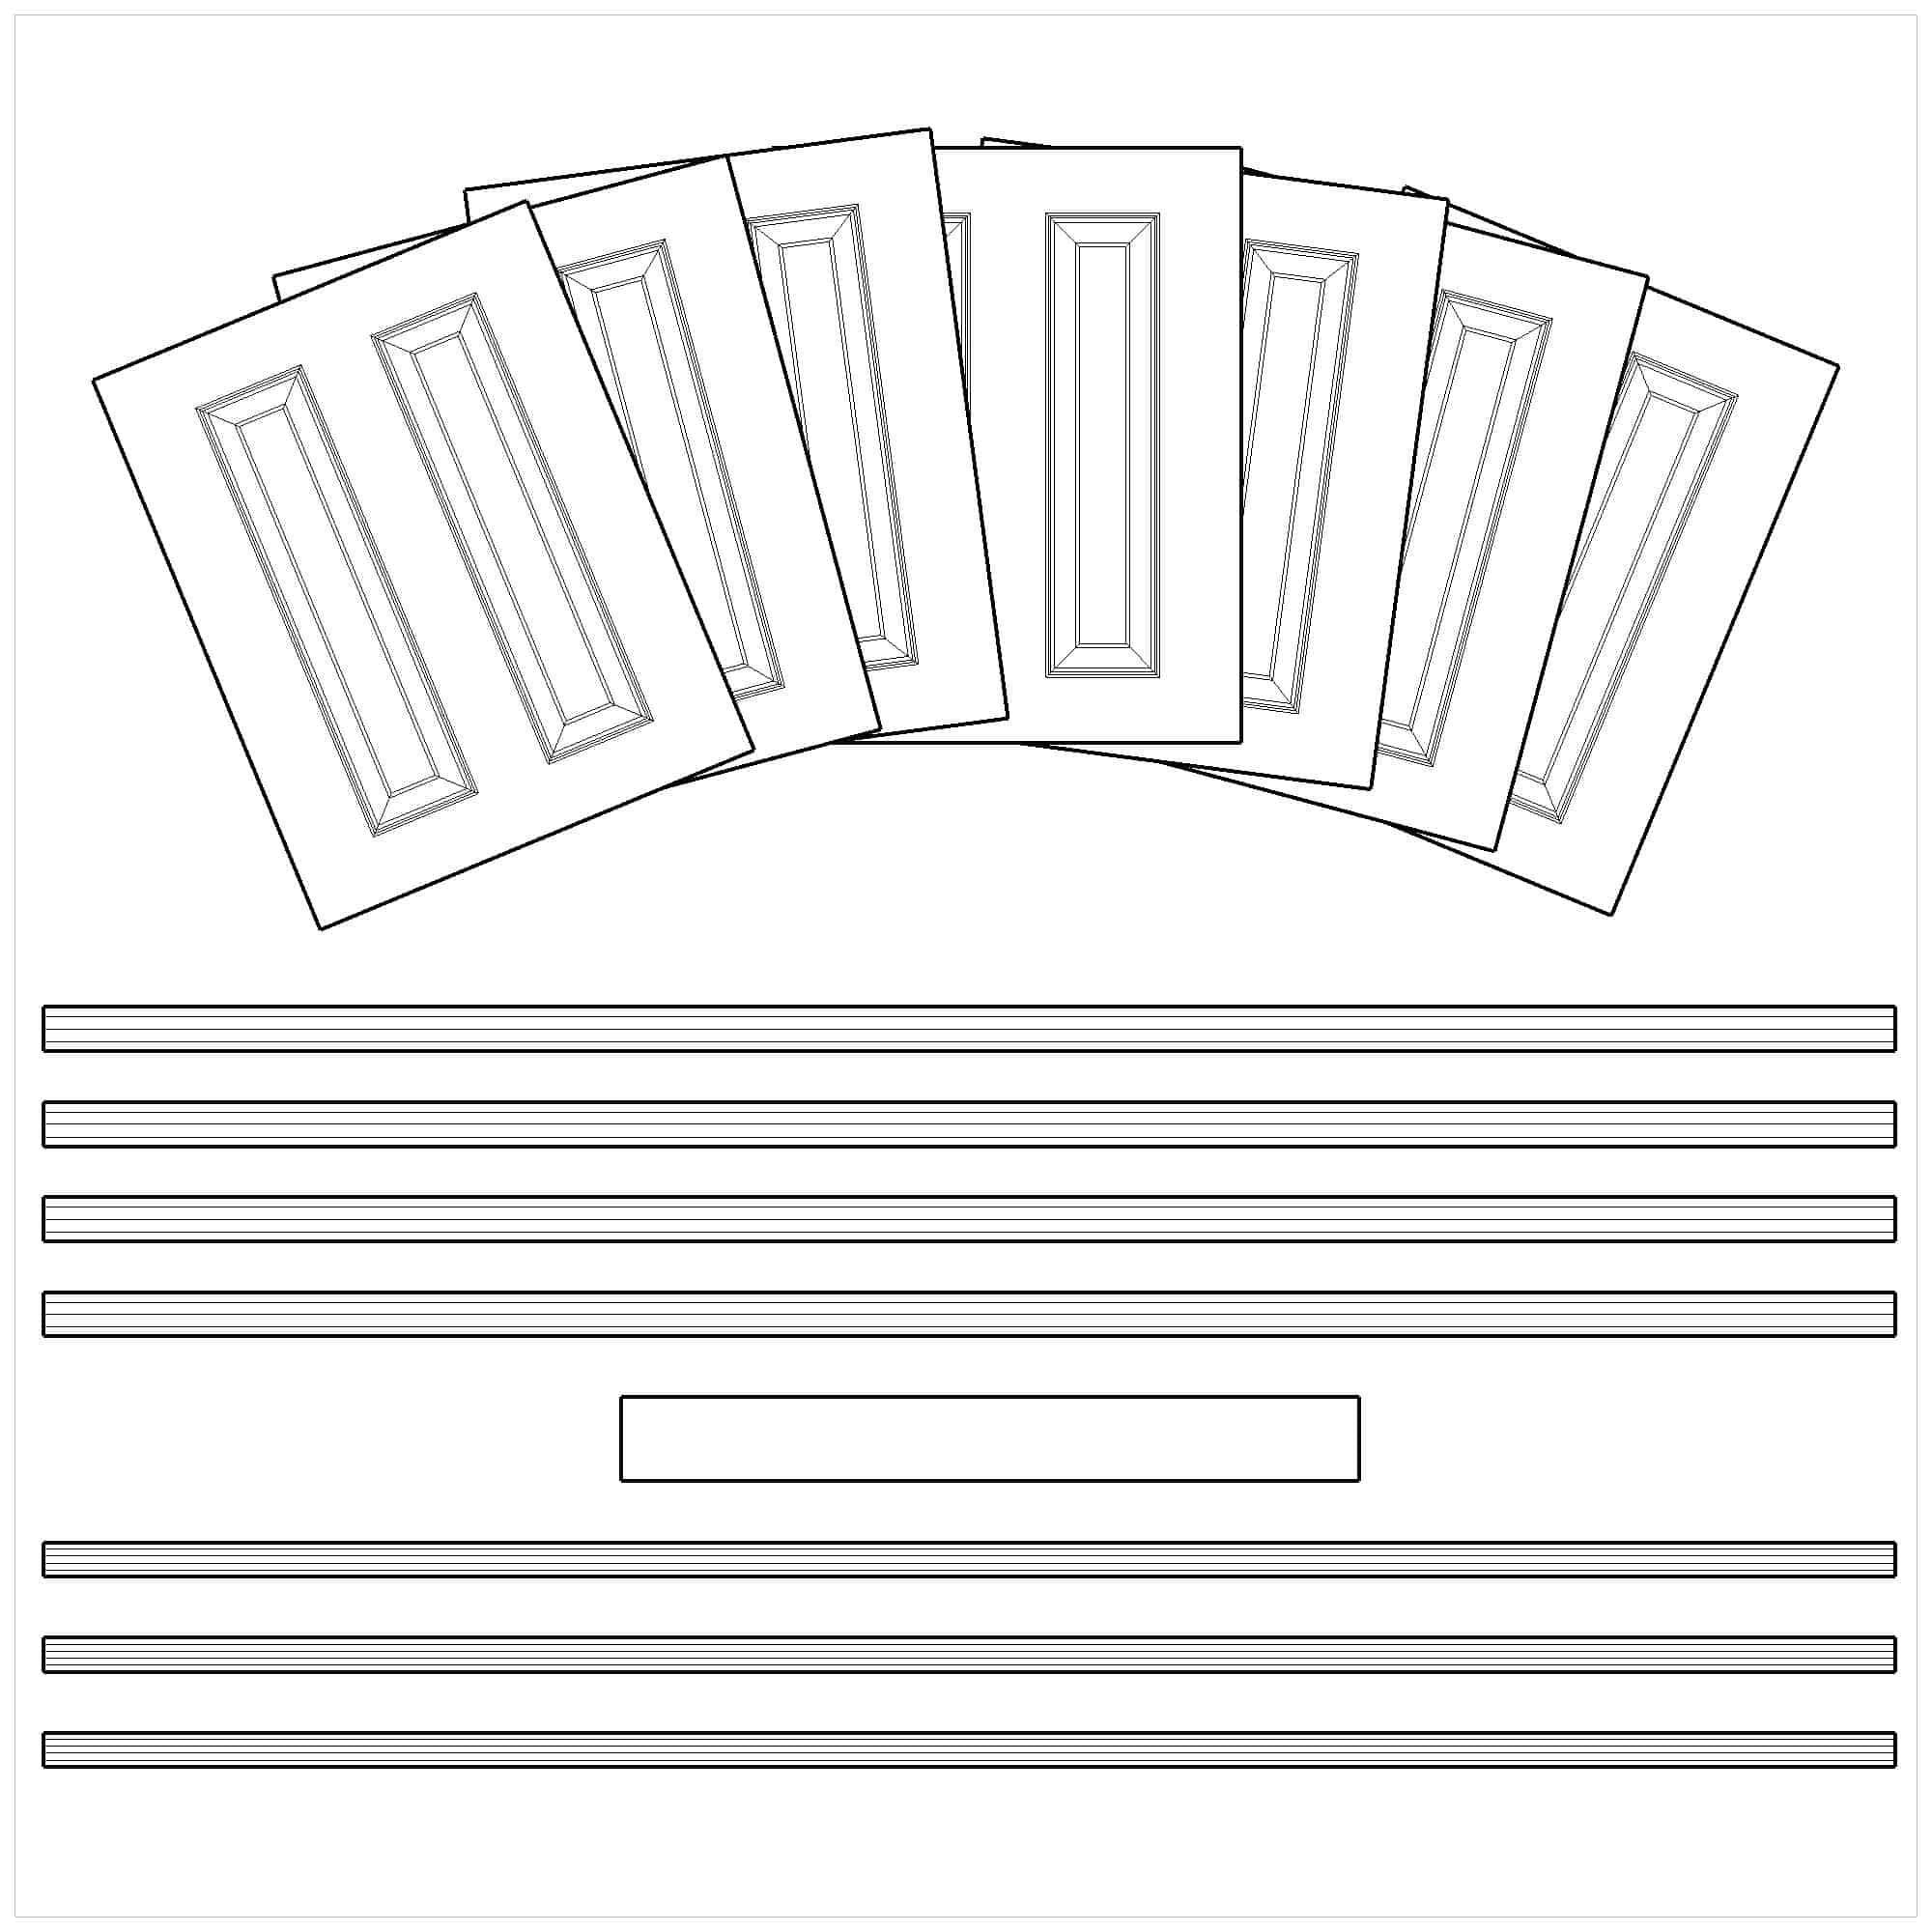 Hare Wall Panelling Dado Pnel Kit 4.6m